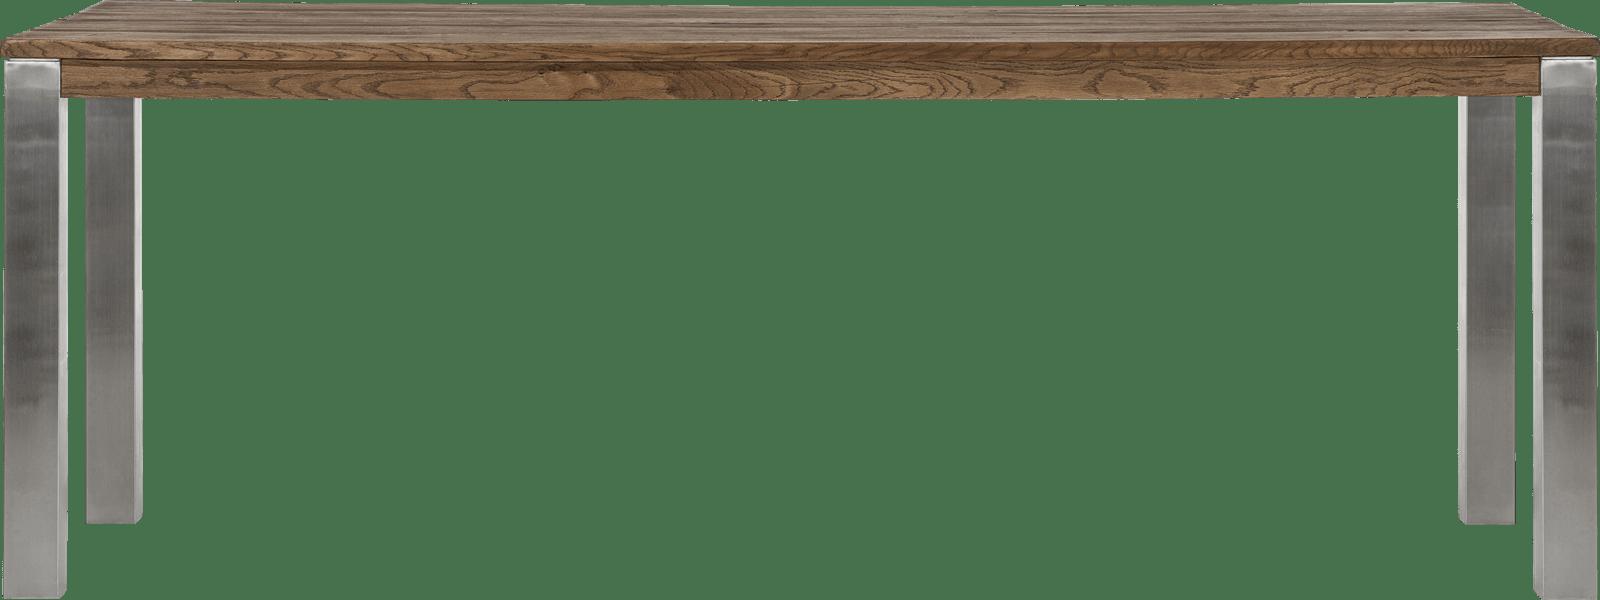 Masters - bartafel 260 x 100 cm - rvs 9x9